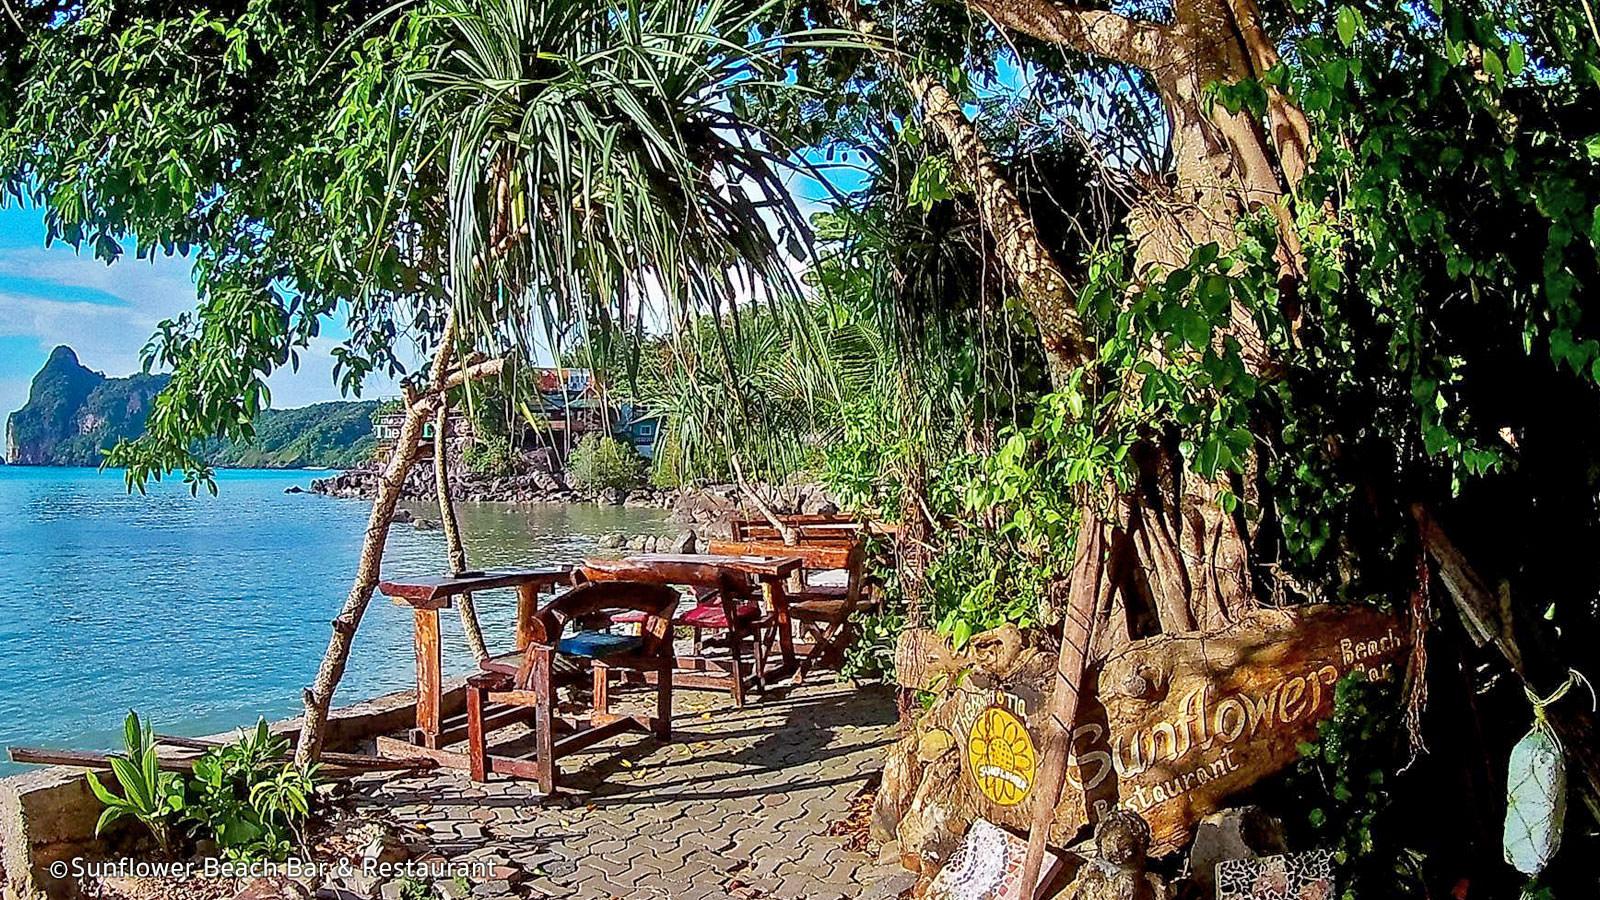 Top Phi Phi Nightlife Place-Sun Flower Beach Bar and Restaurant